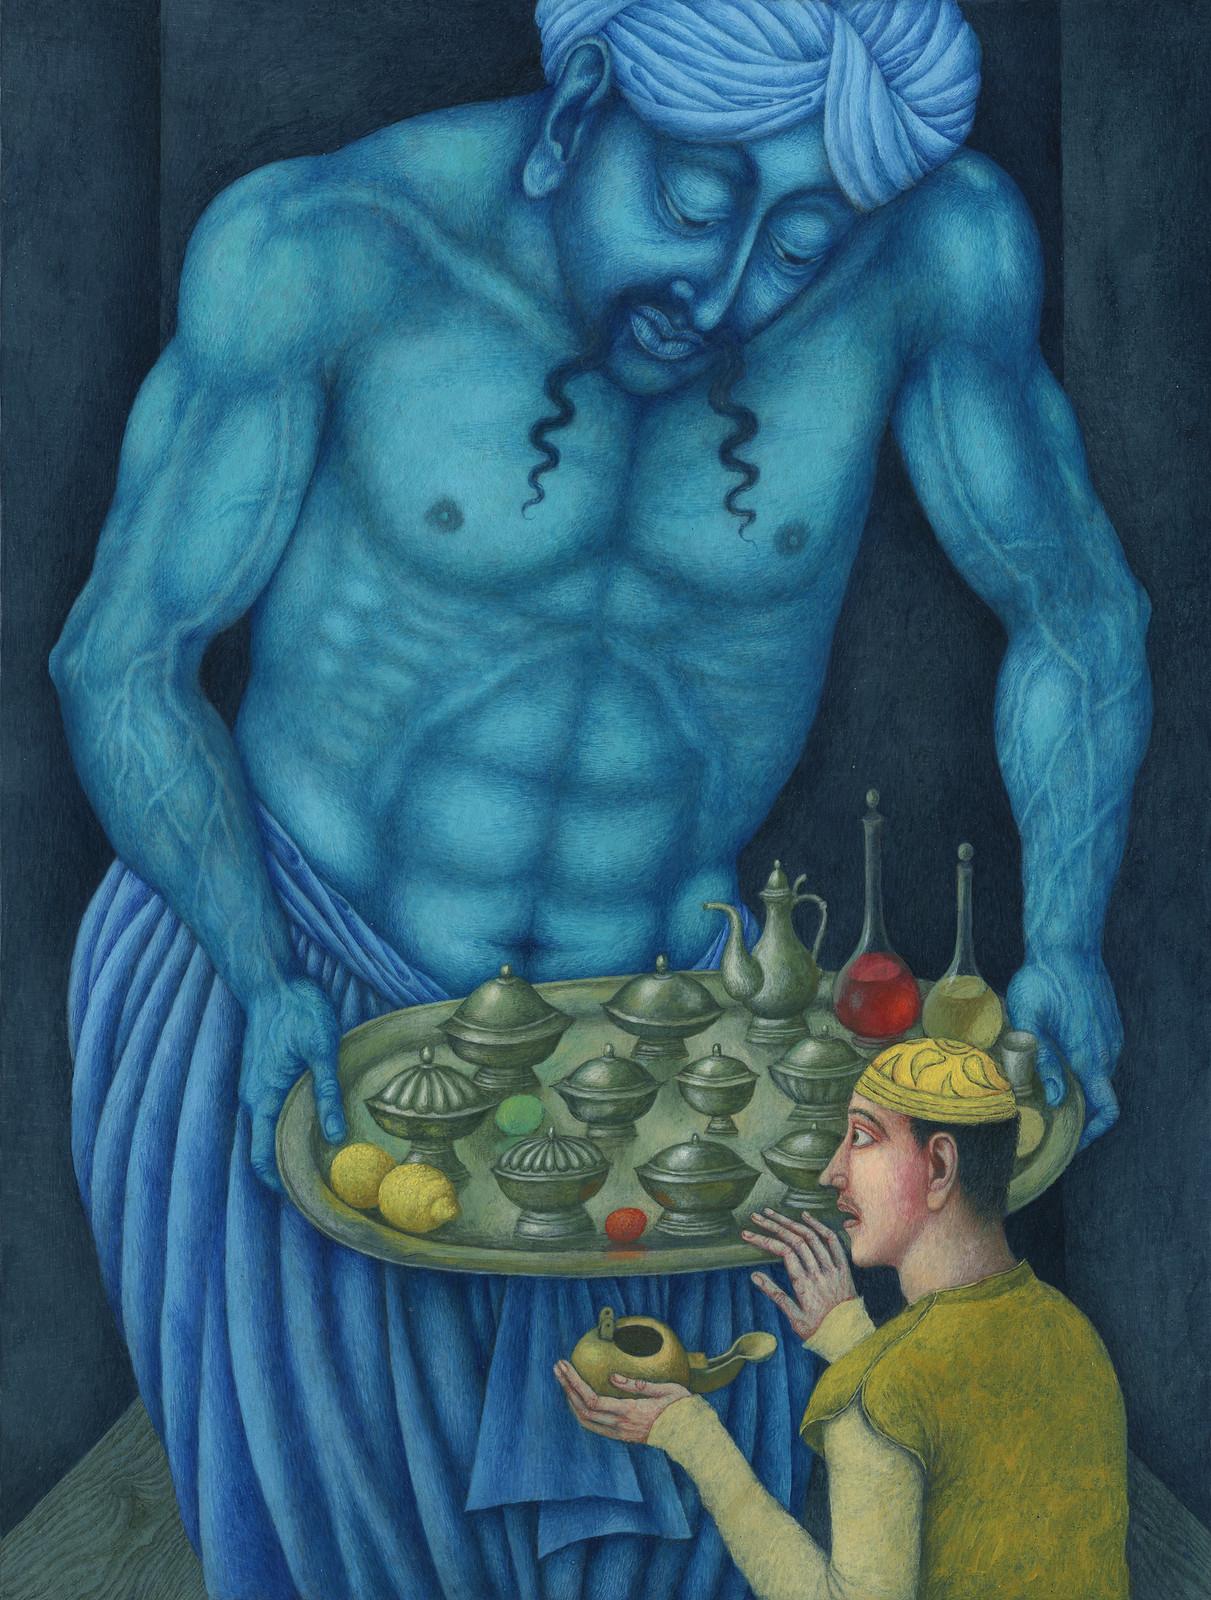 Jindra Capek - Athousand and One Nights, Illustration 4